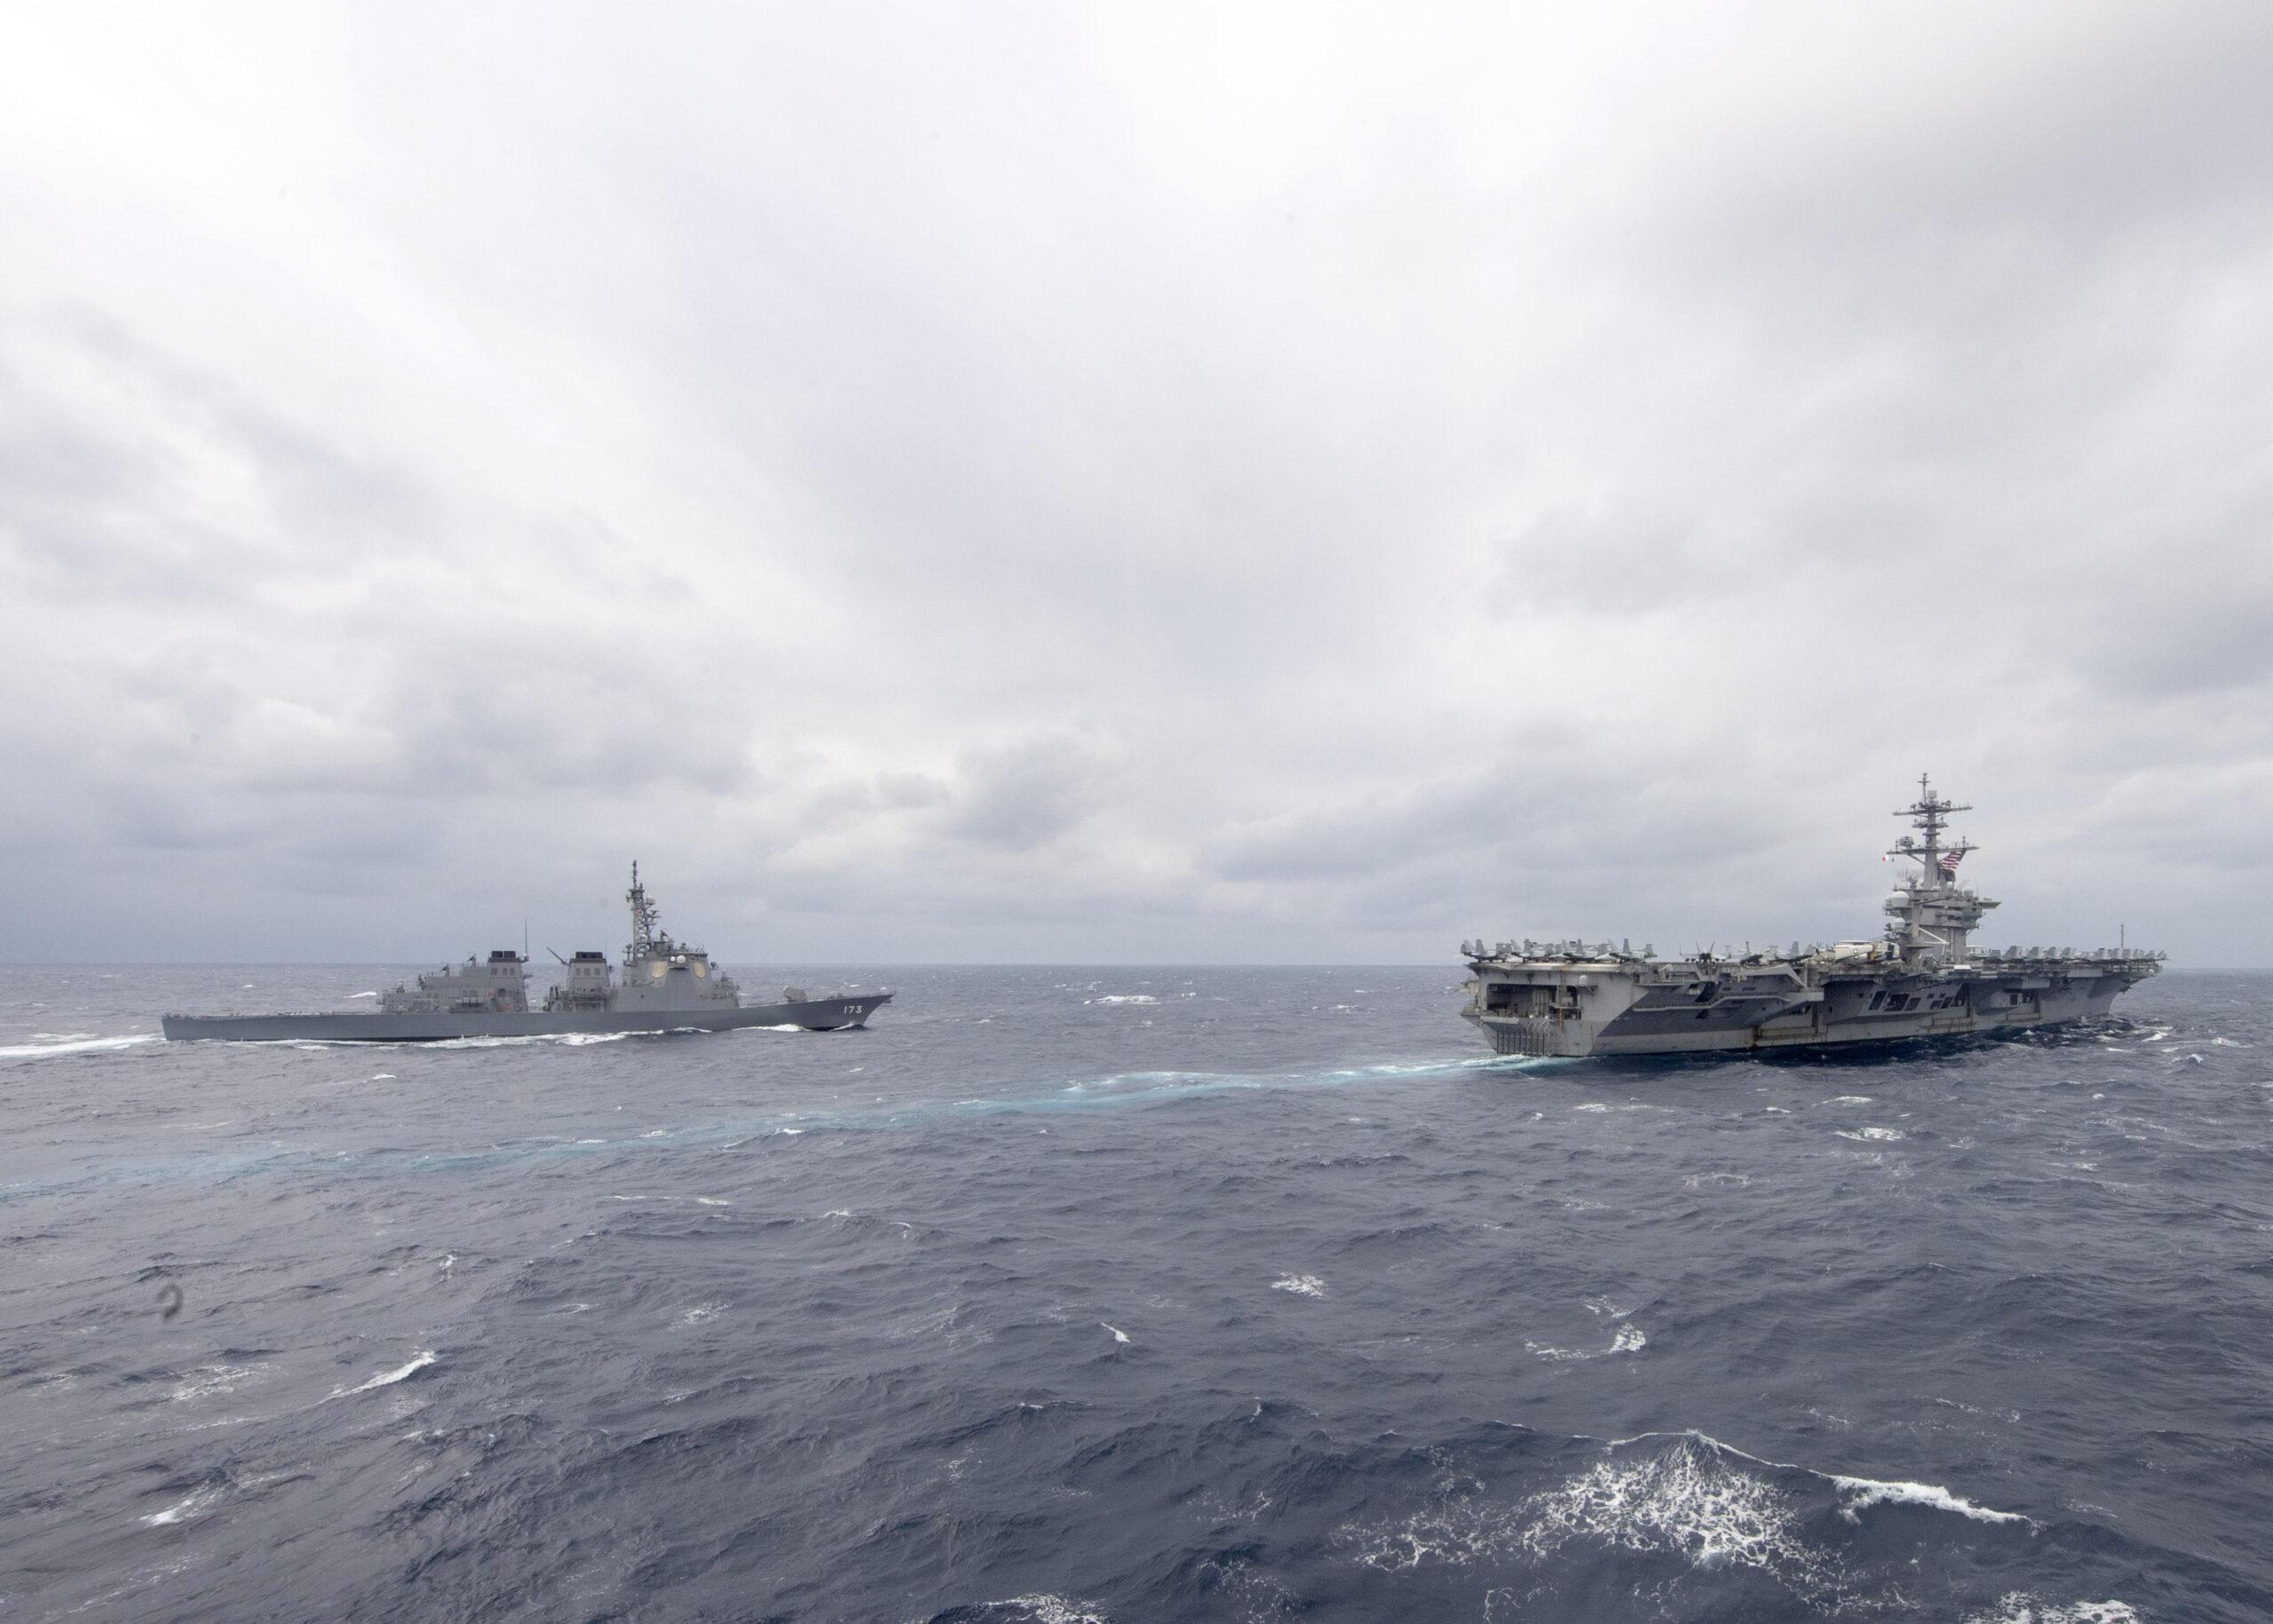 210115 n hi500 1189 scaled - naval post- naval news and information